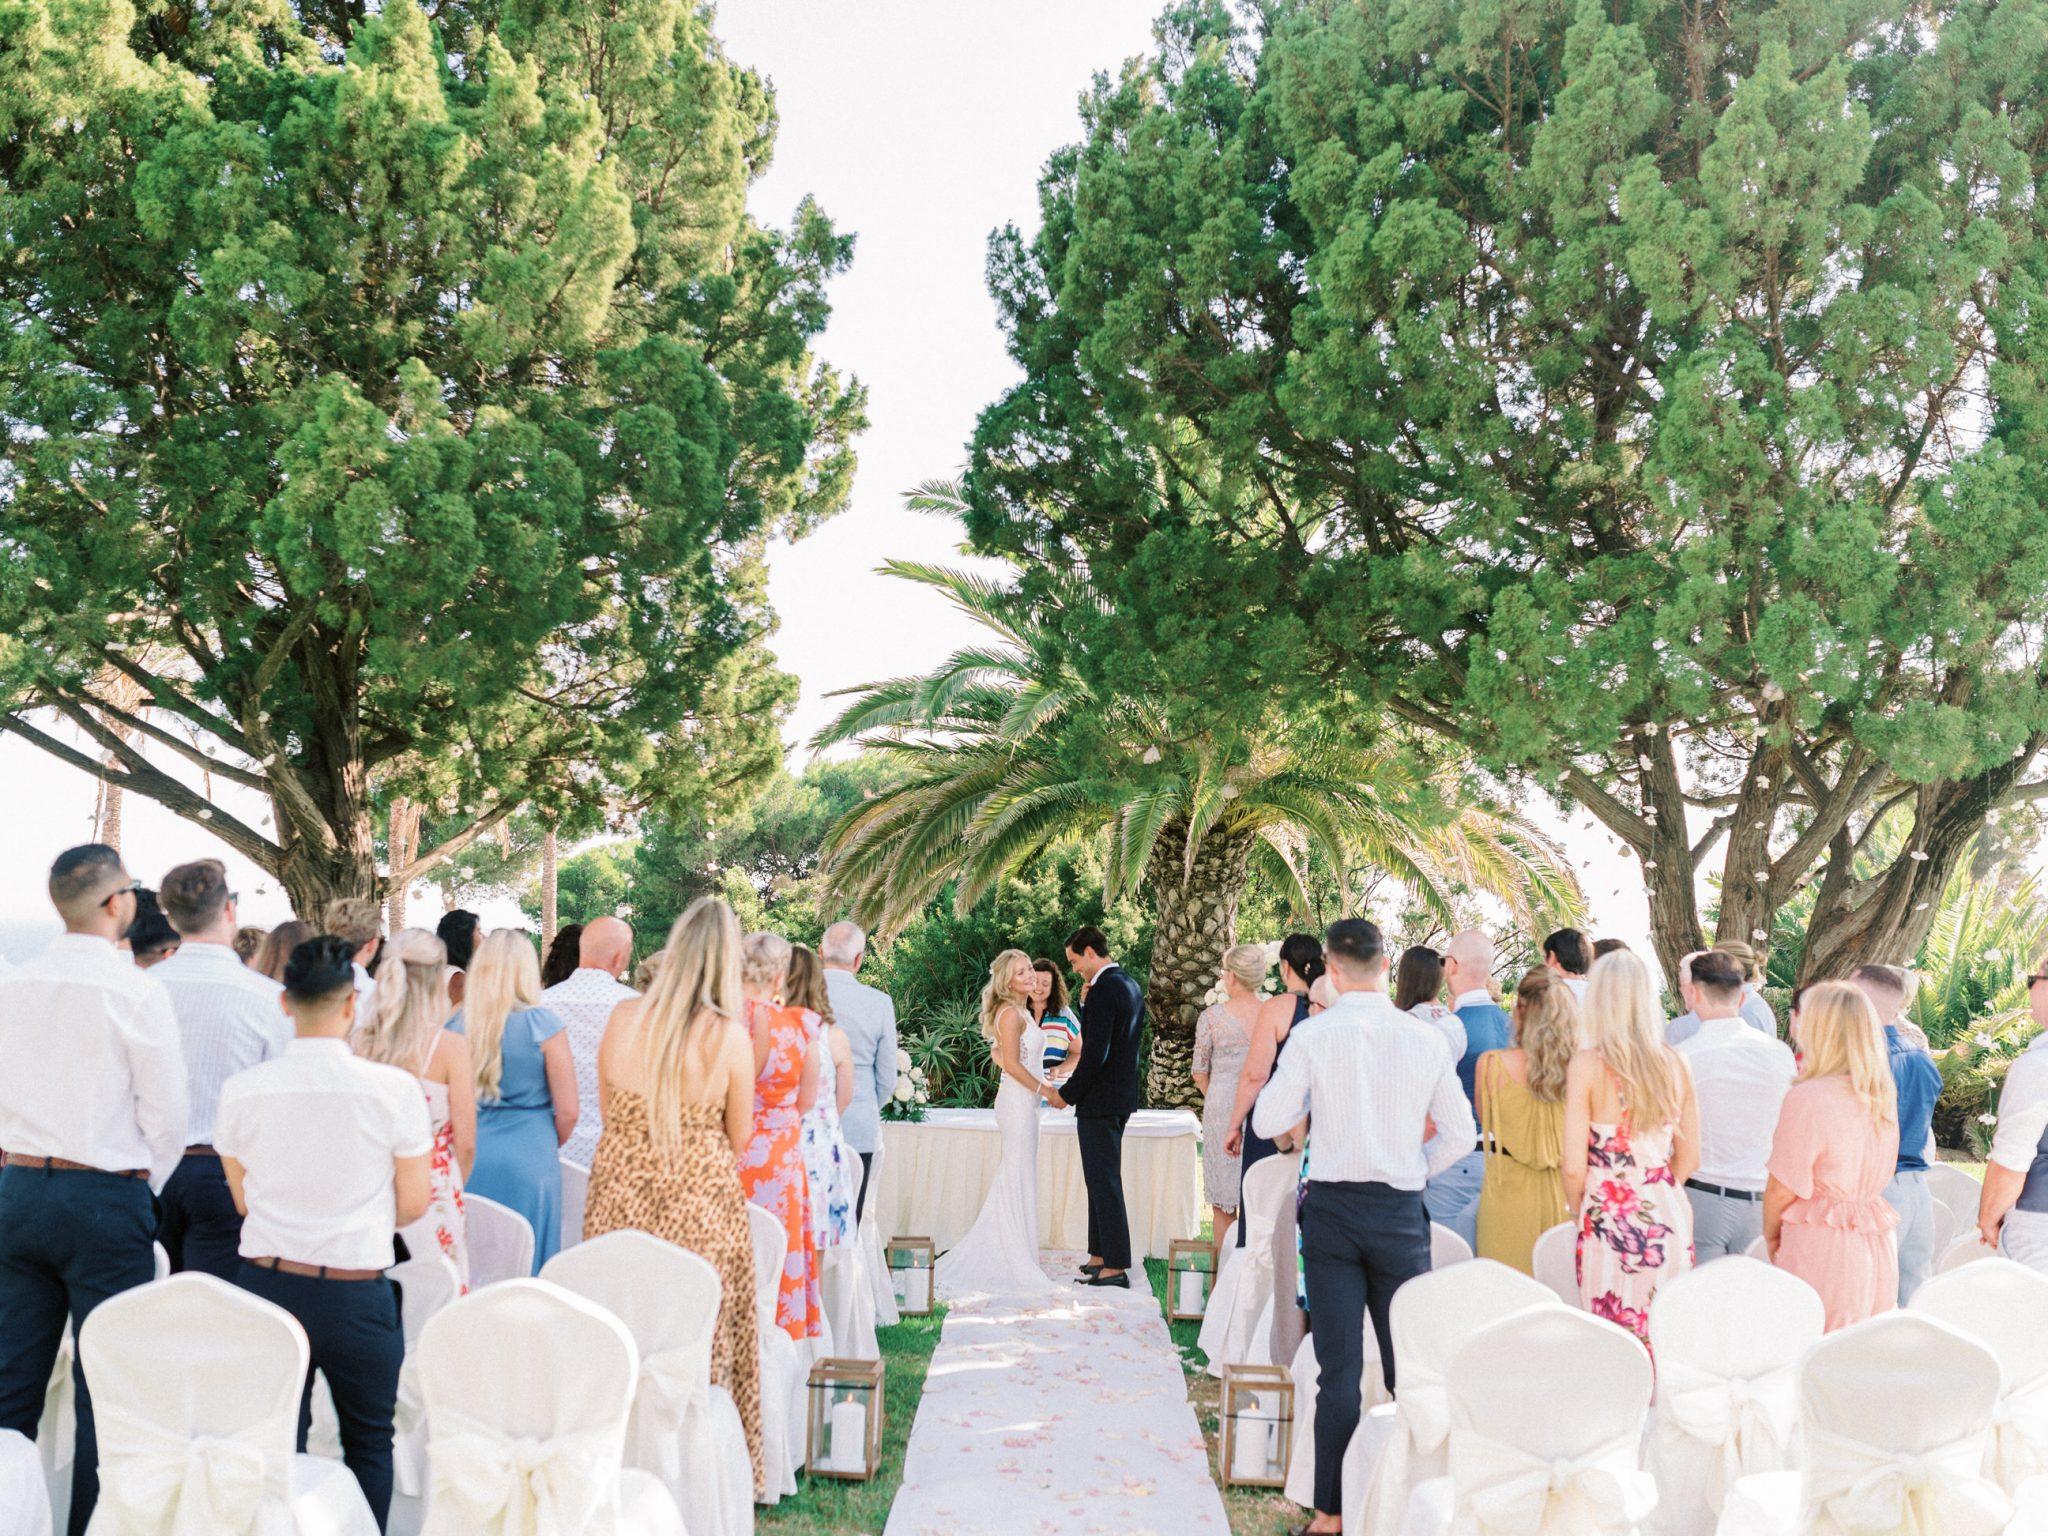 Best Wedding Photographer Algarve - Portugal